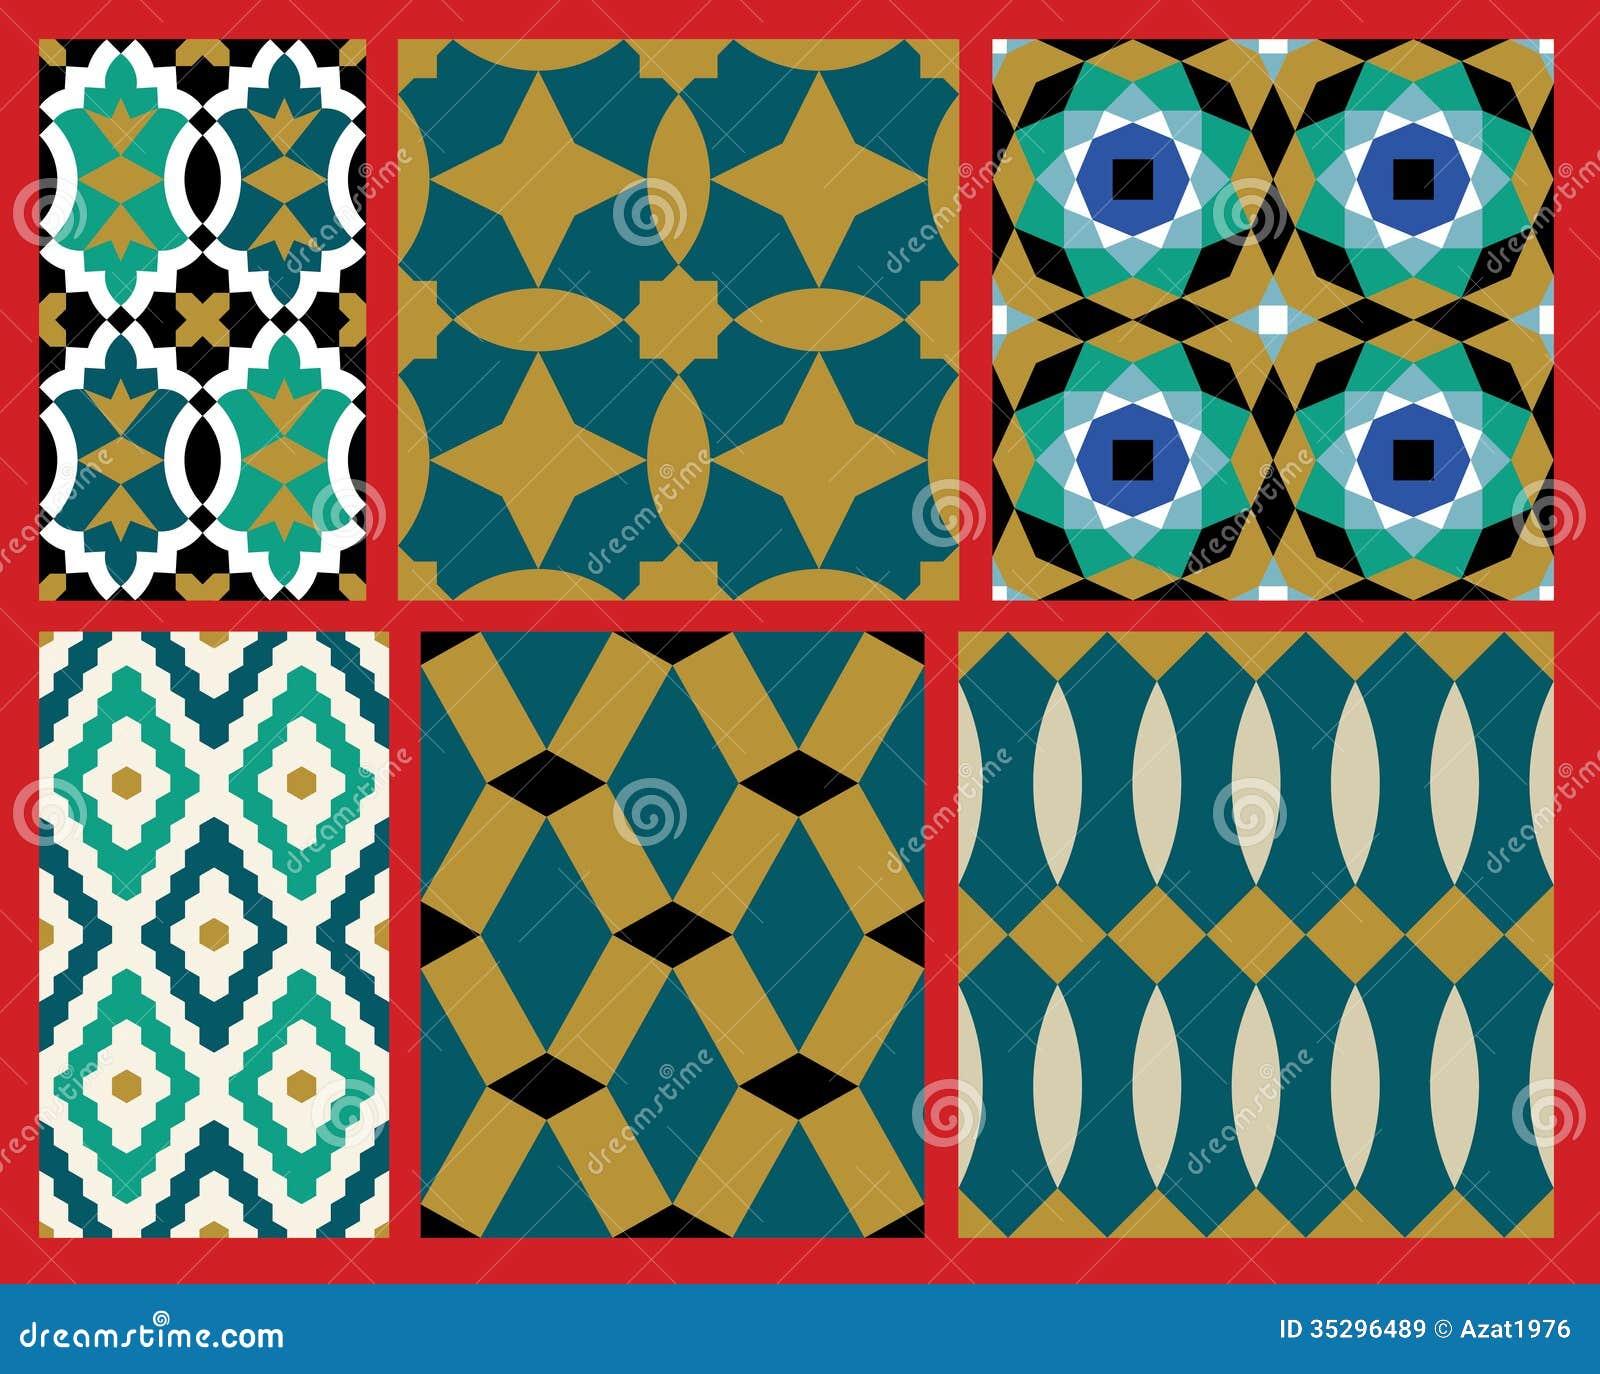 Moroccan geometric pattern royalty free stock photos image 13547078 - Aup Moorish Patterns Set Royalty Free Stock Images